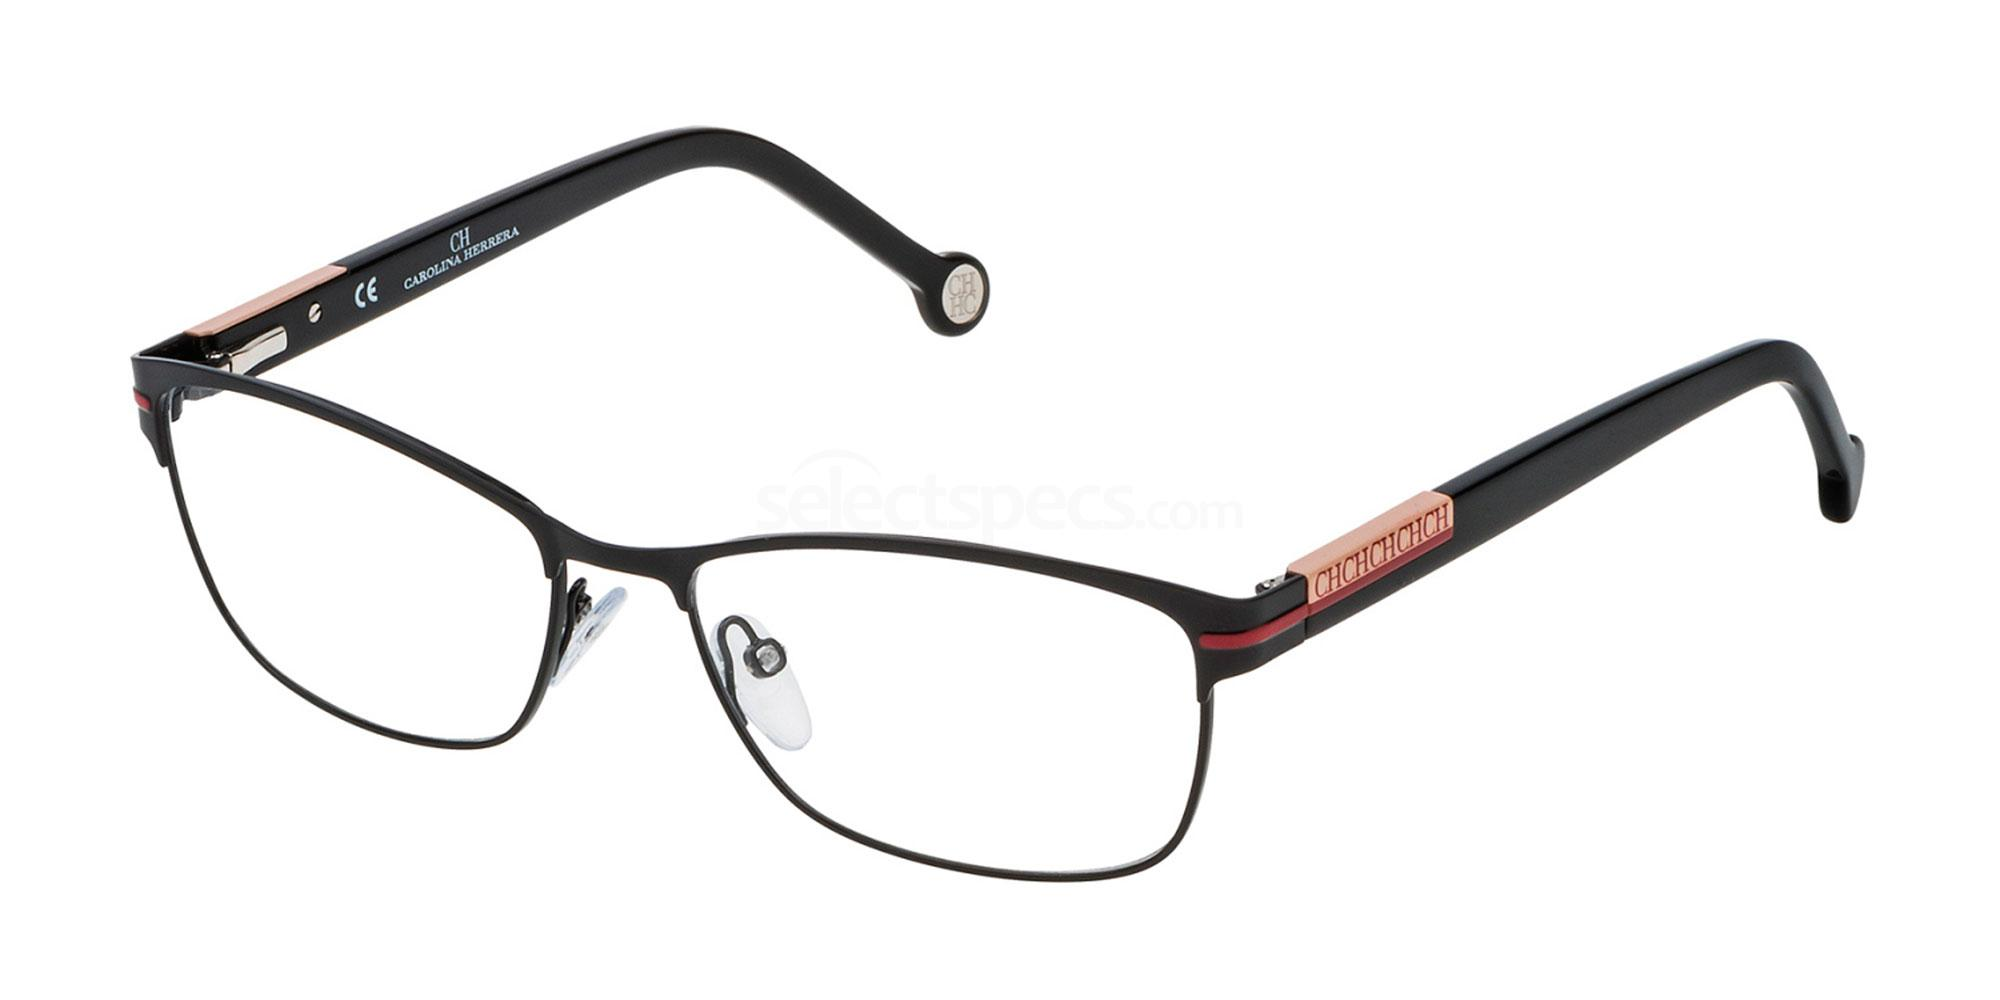 0530 VHE096 Glasses, CH Carolina Herrera